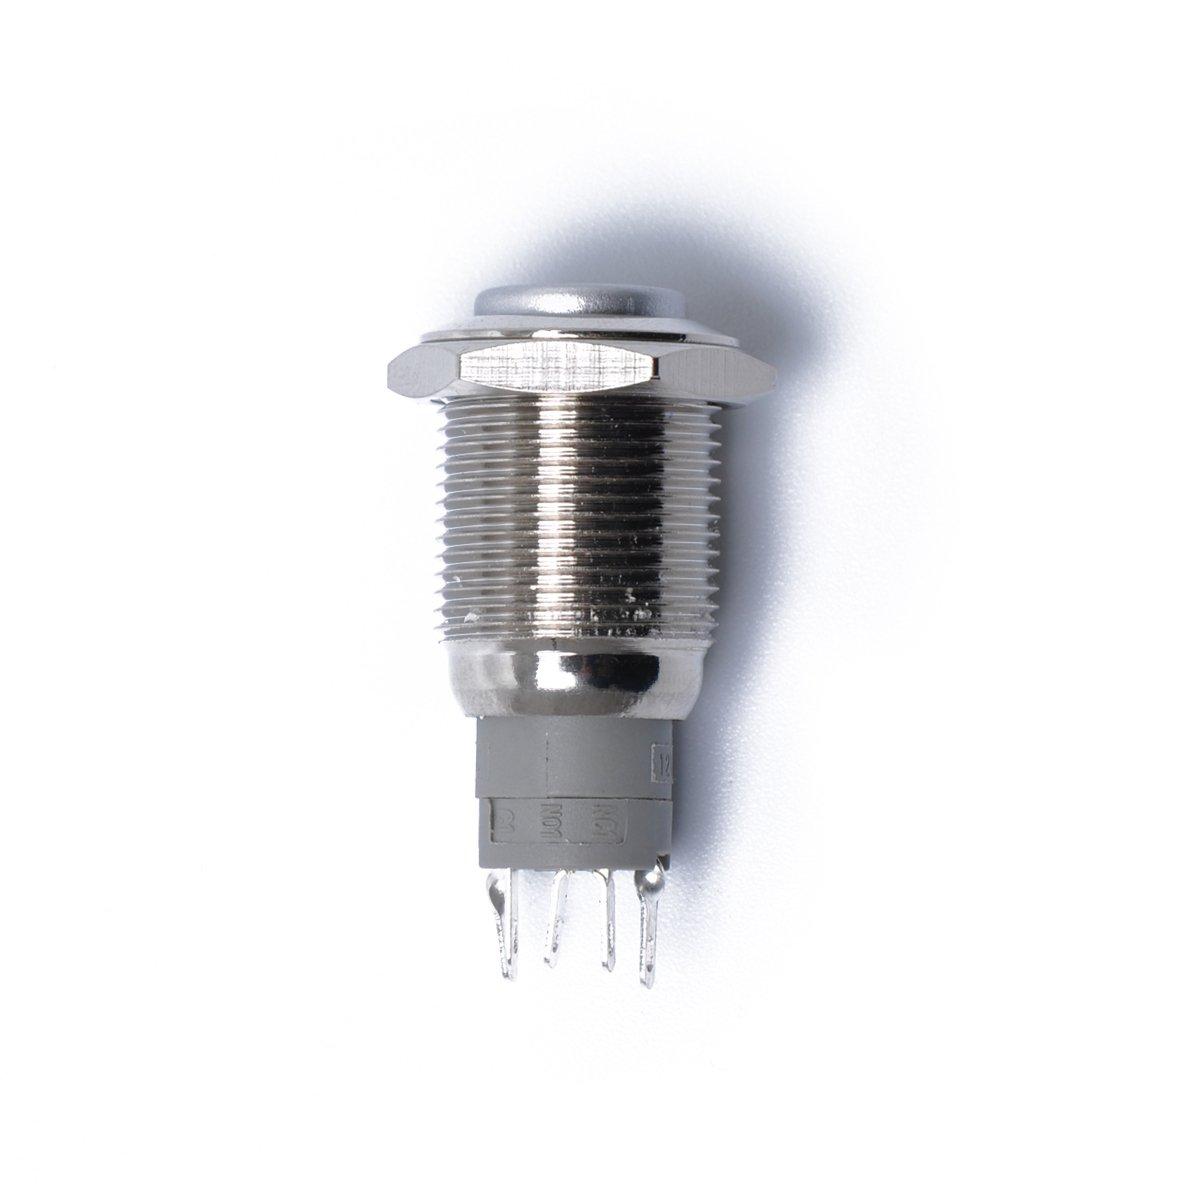 VORCOOL 12/V 16/mm LED iluminaci/ón LED Encendido//Apagado Interruptor Bot/ón De Reinicio de metal momentan/é pulsador cuerno interruptor coche barco moto DIY interruptor